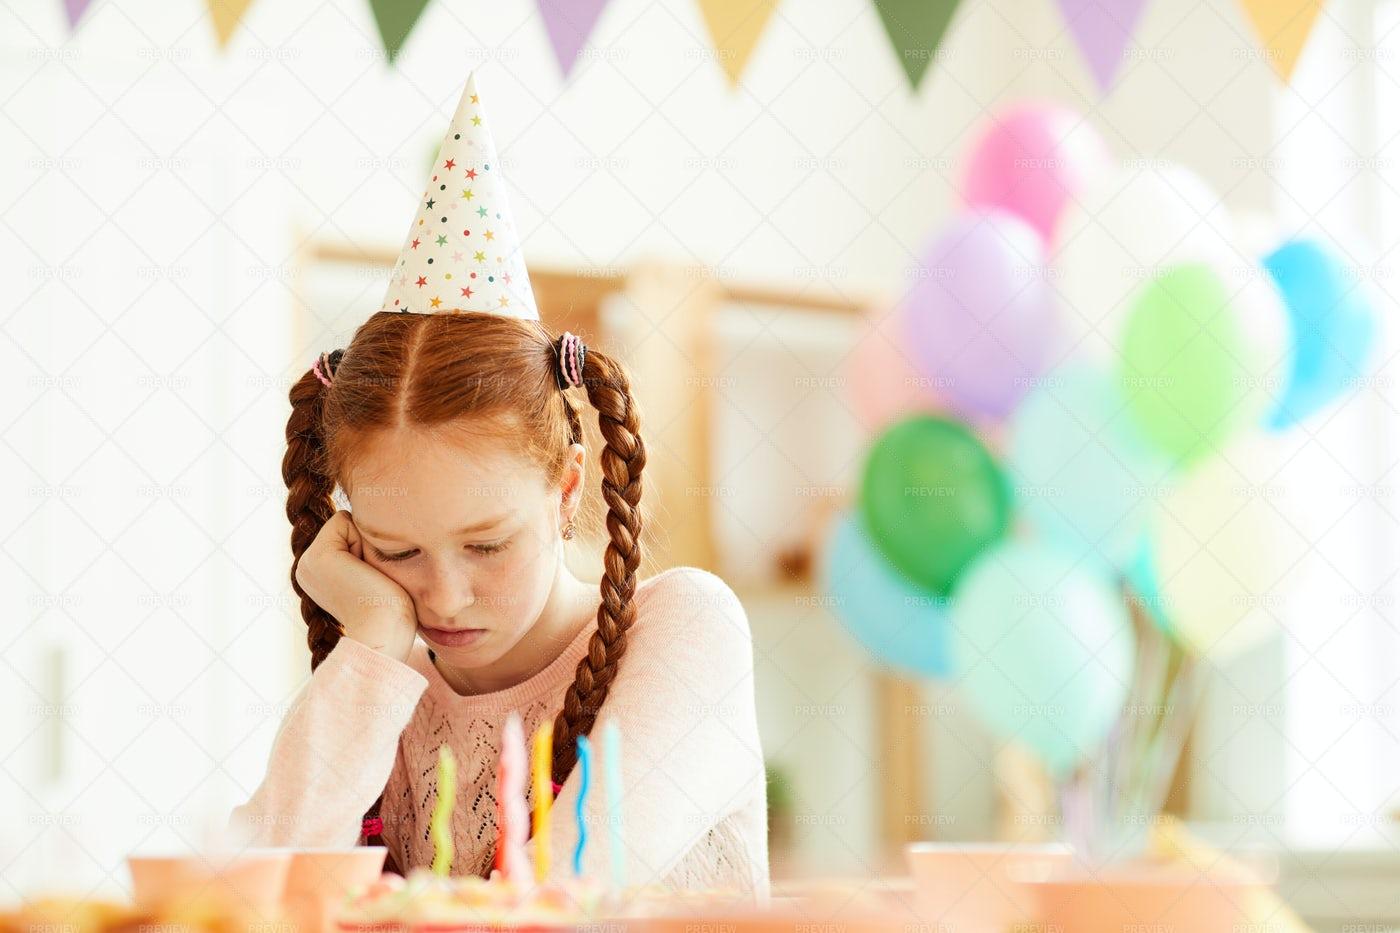 Sad Girl Alone At Party: Stock Photos